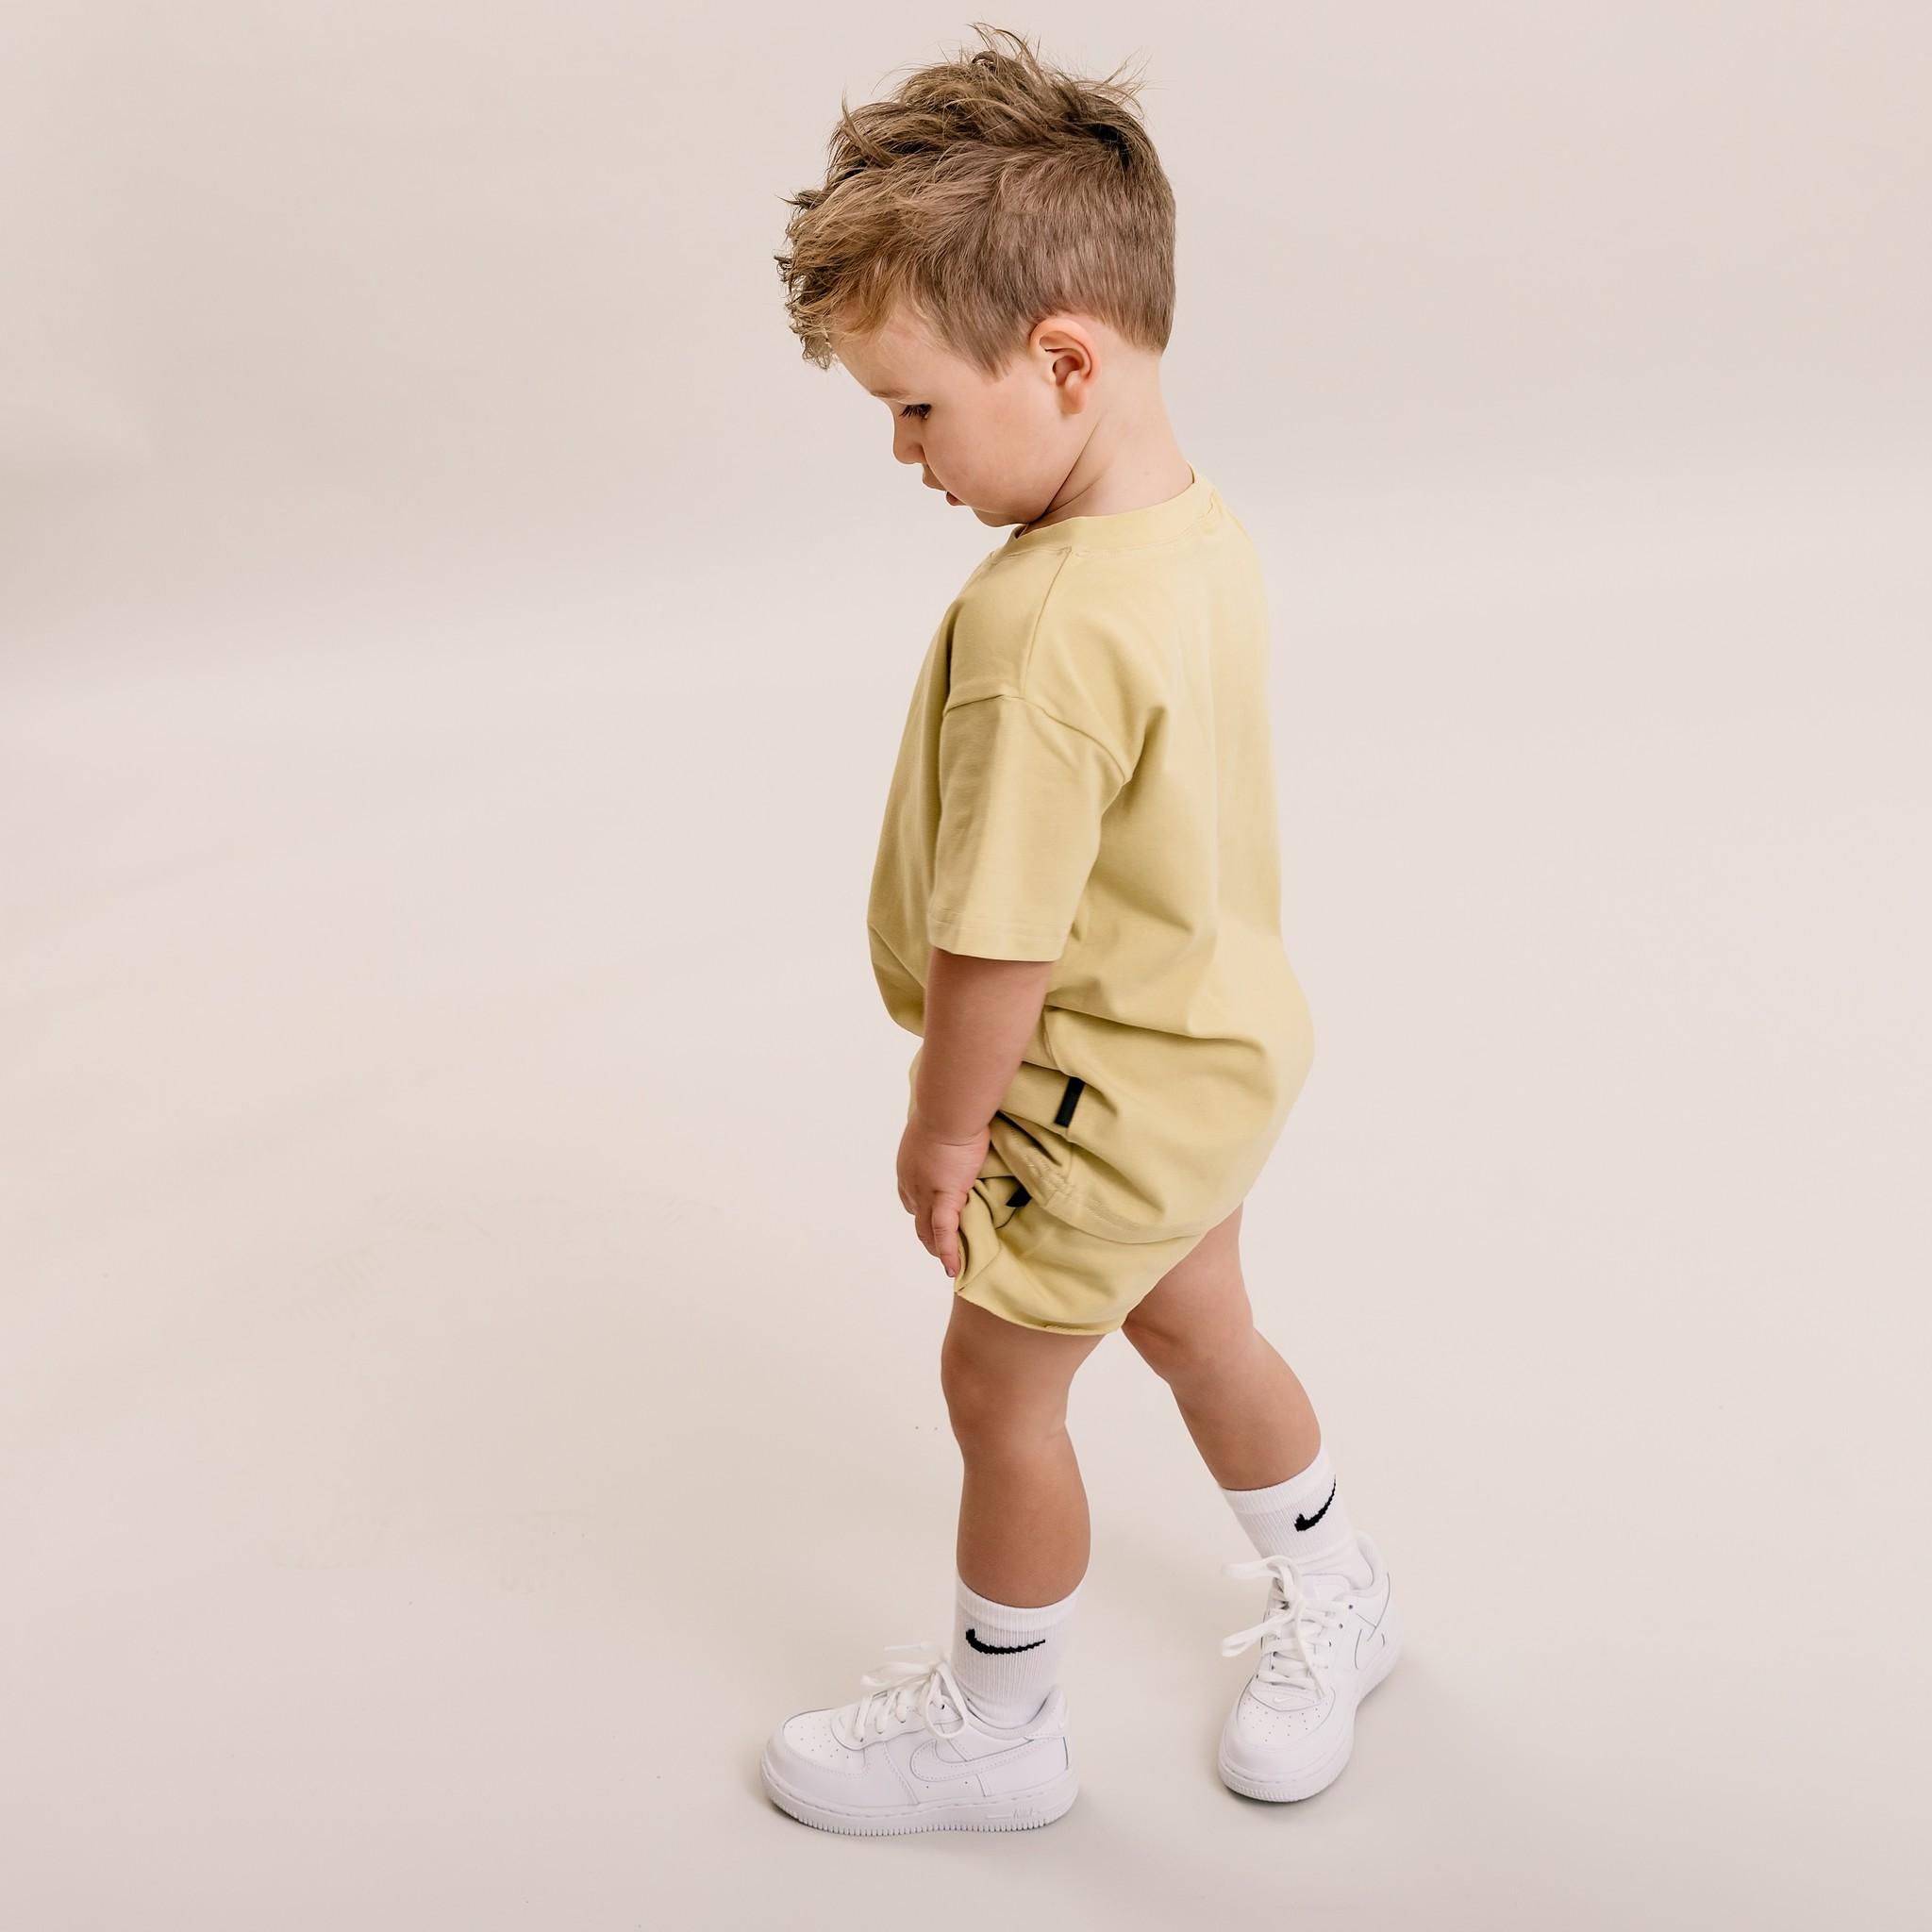 No Labels Kidswear YELLOW BERMUDE   SHORT PANTS YELLOW   CHILDREN'S CLOTHES